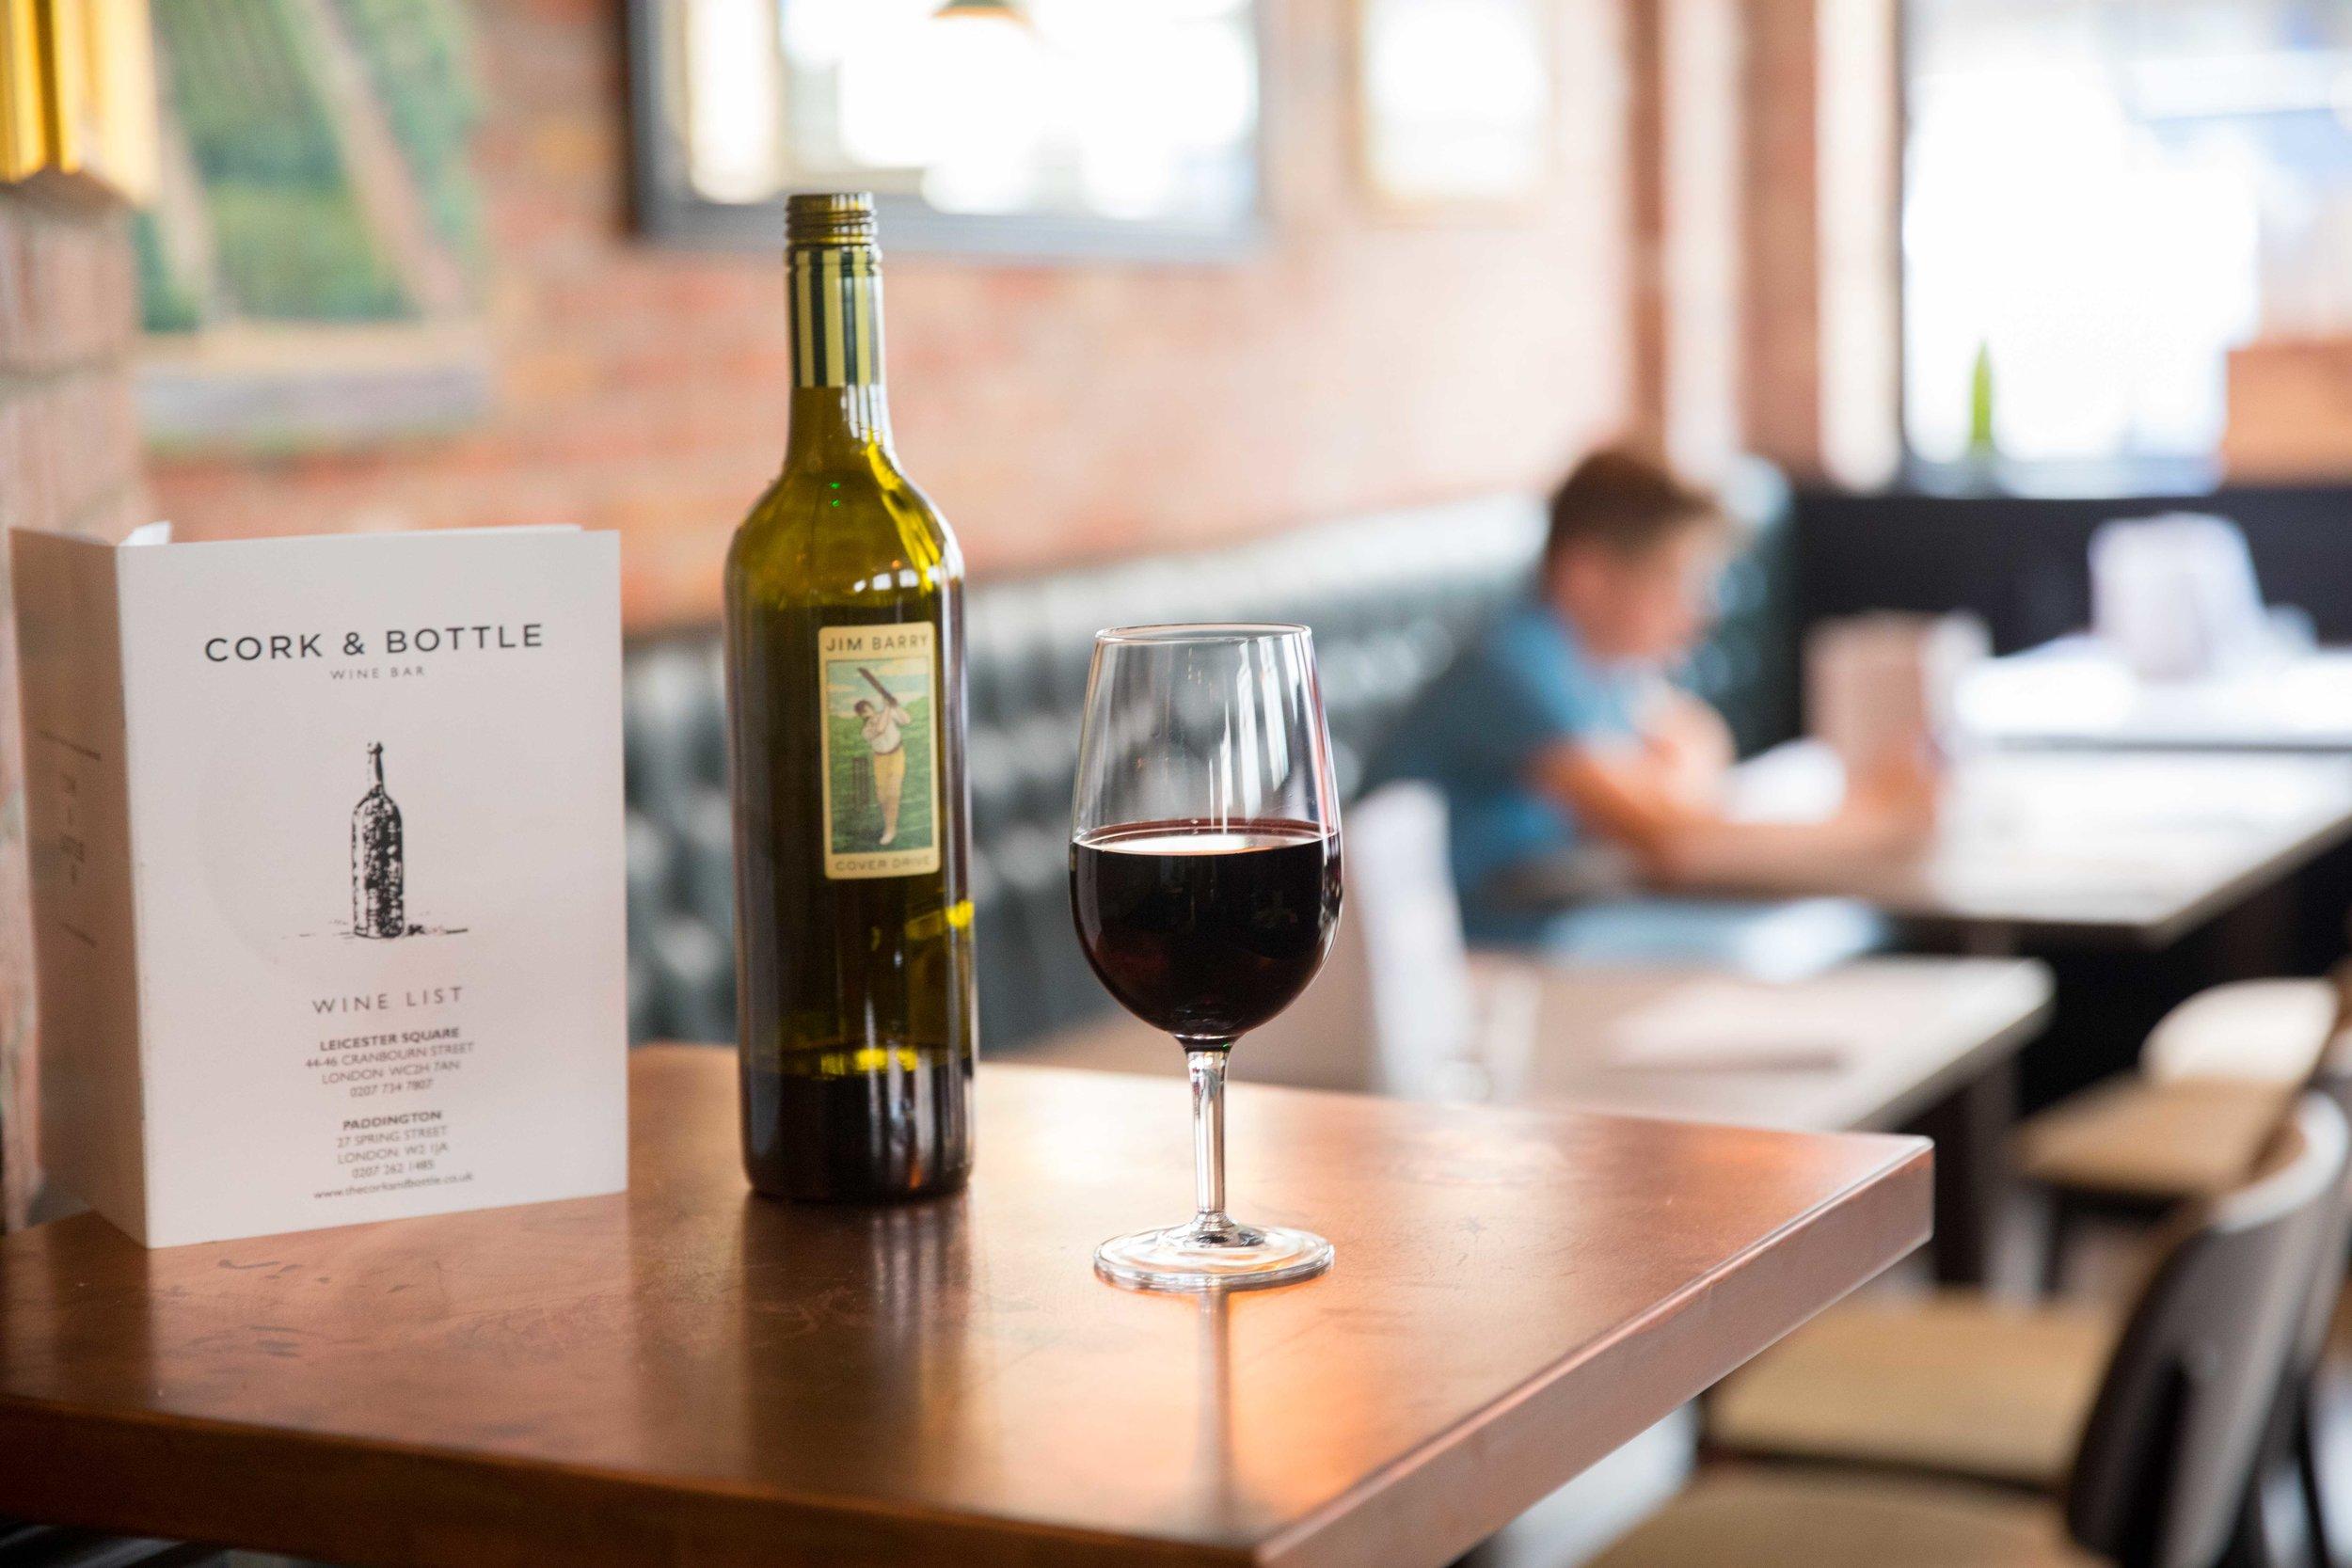 Commercial photography for Cork & Bottle Wine Bar in Paddington, London